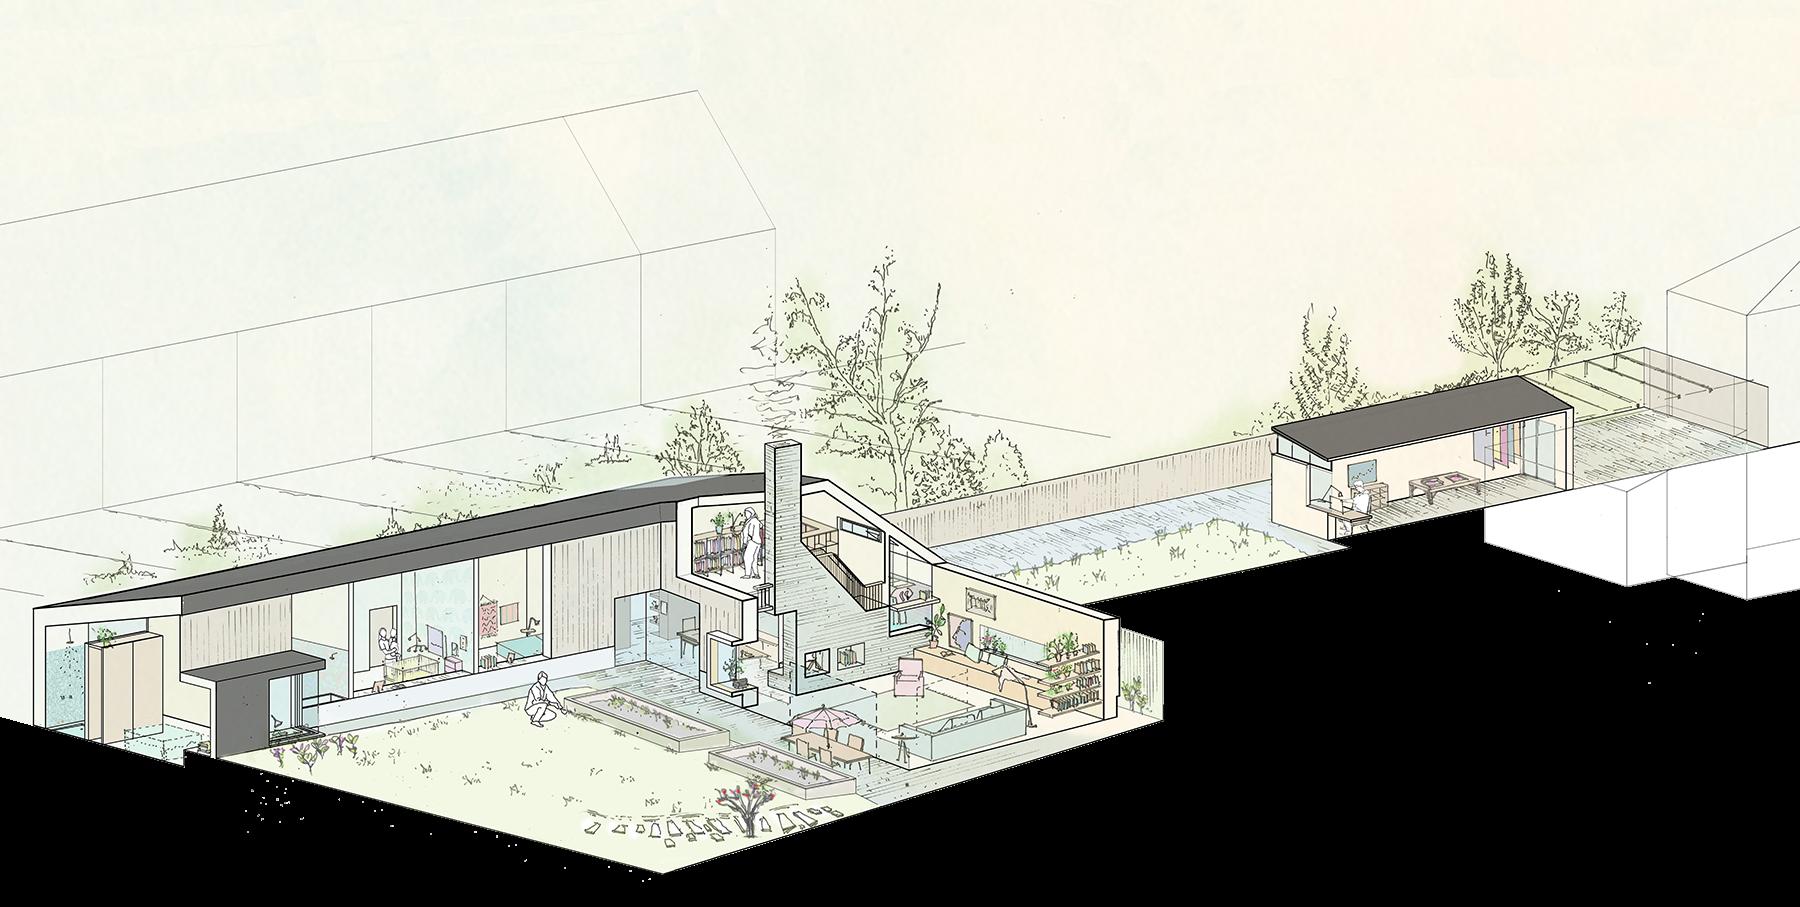 Sarah-Wigglesworth-Architects Haycroft-Gardens Overview-Year-1 1800